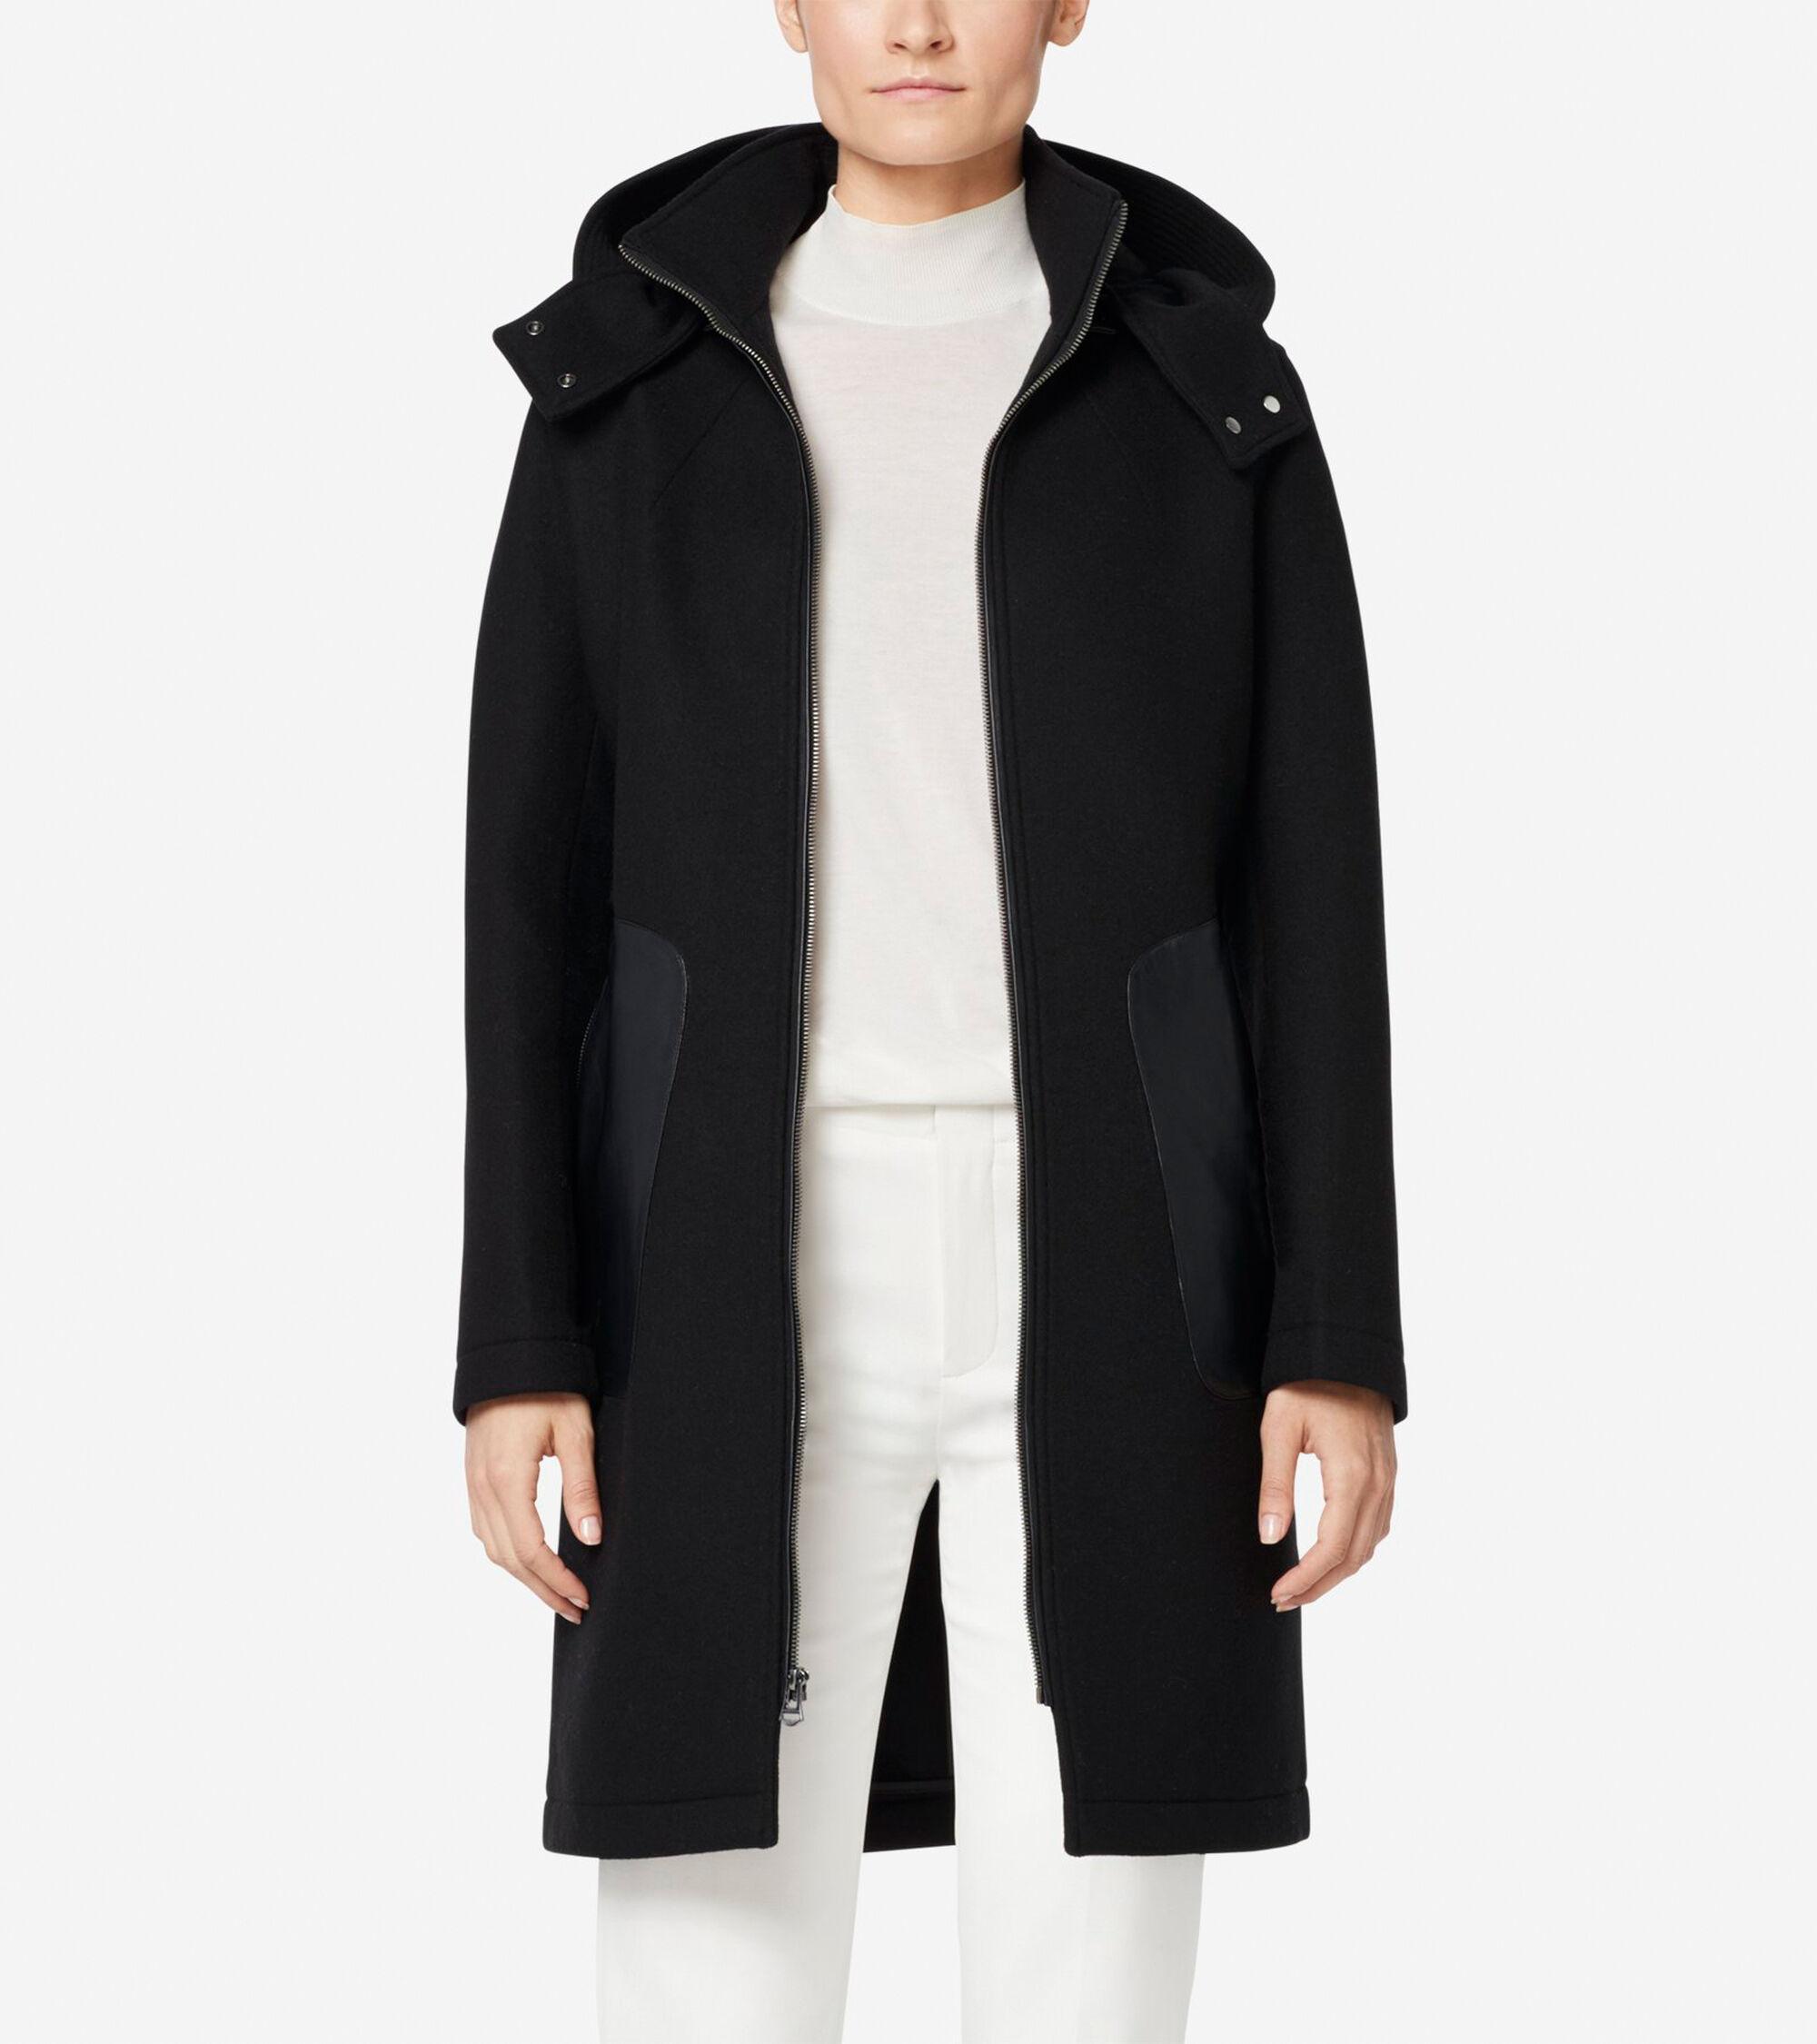 aae24e9857c1b Women s Grand.OS Neoprene Wool Jacket in Black